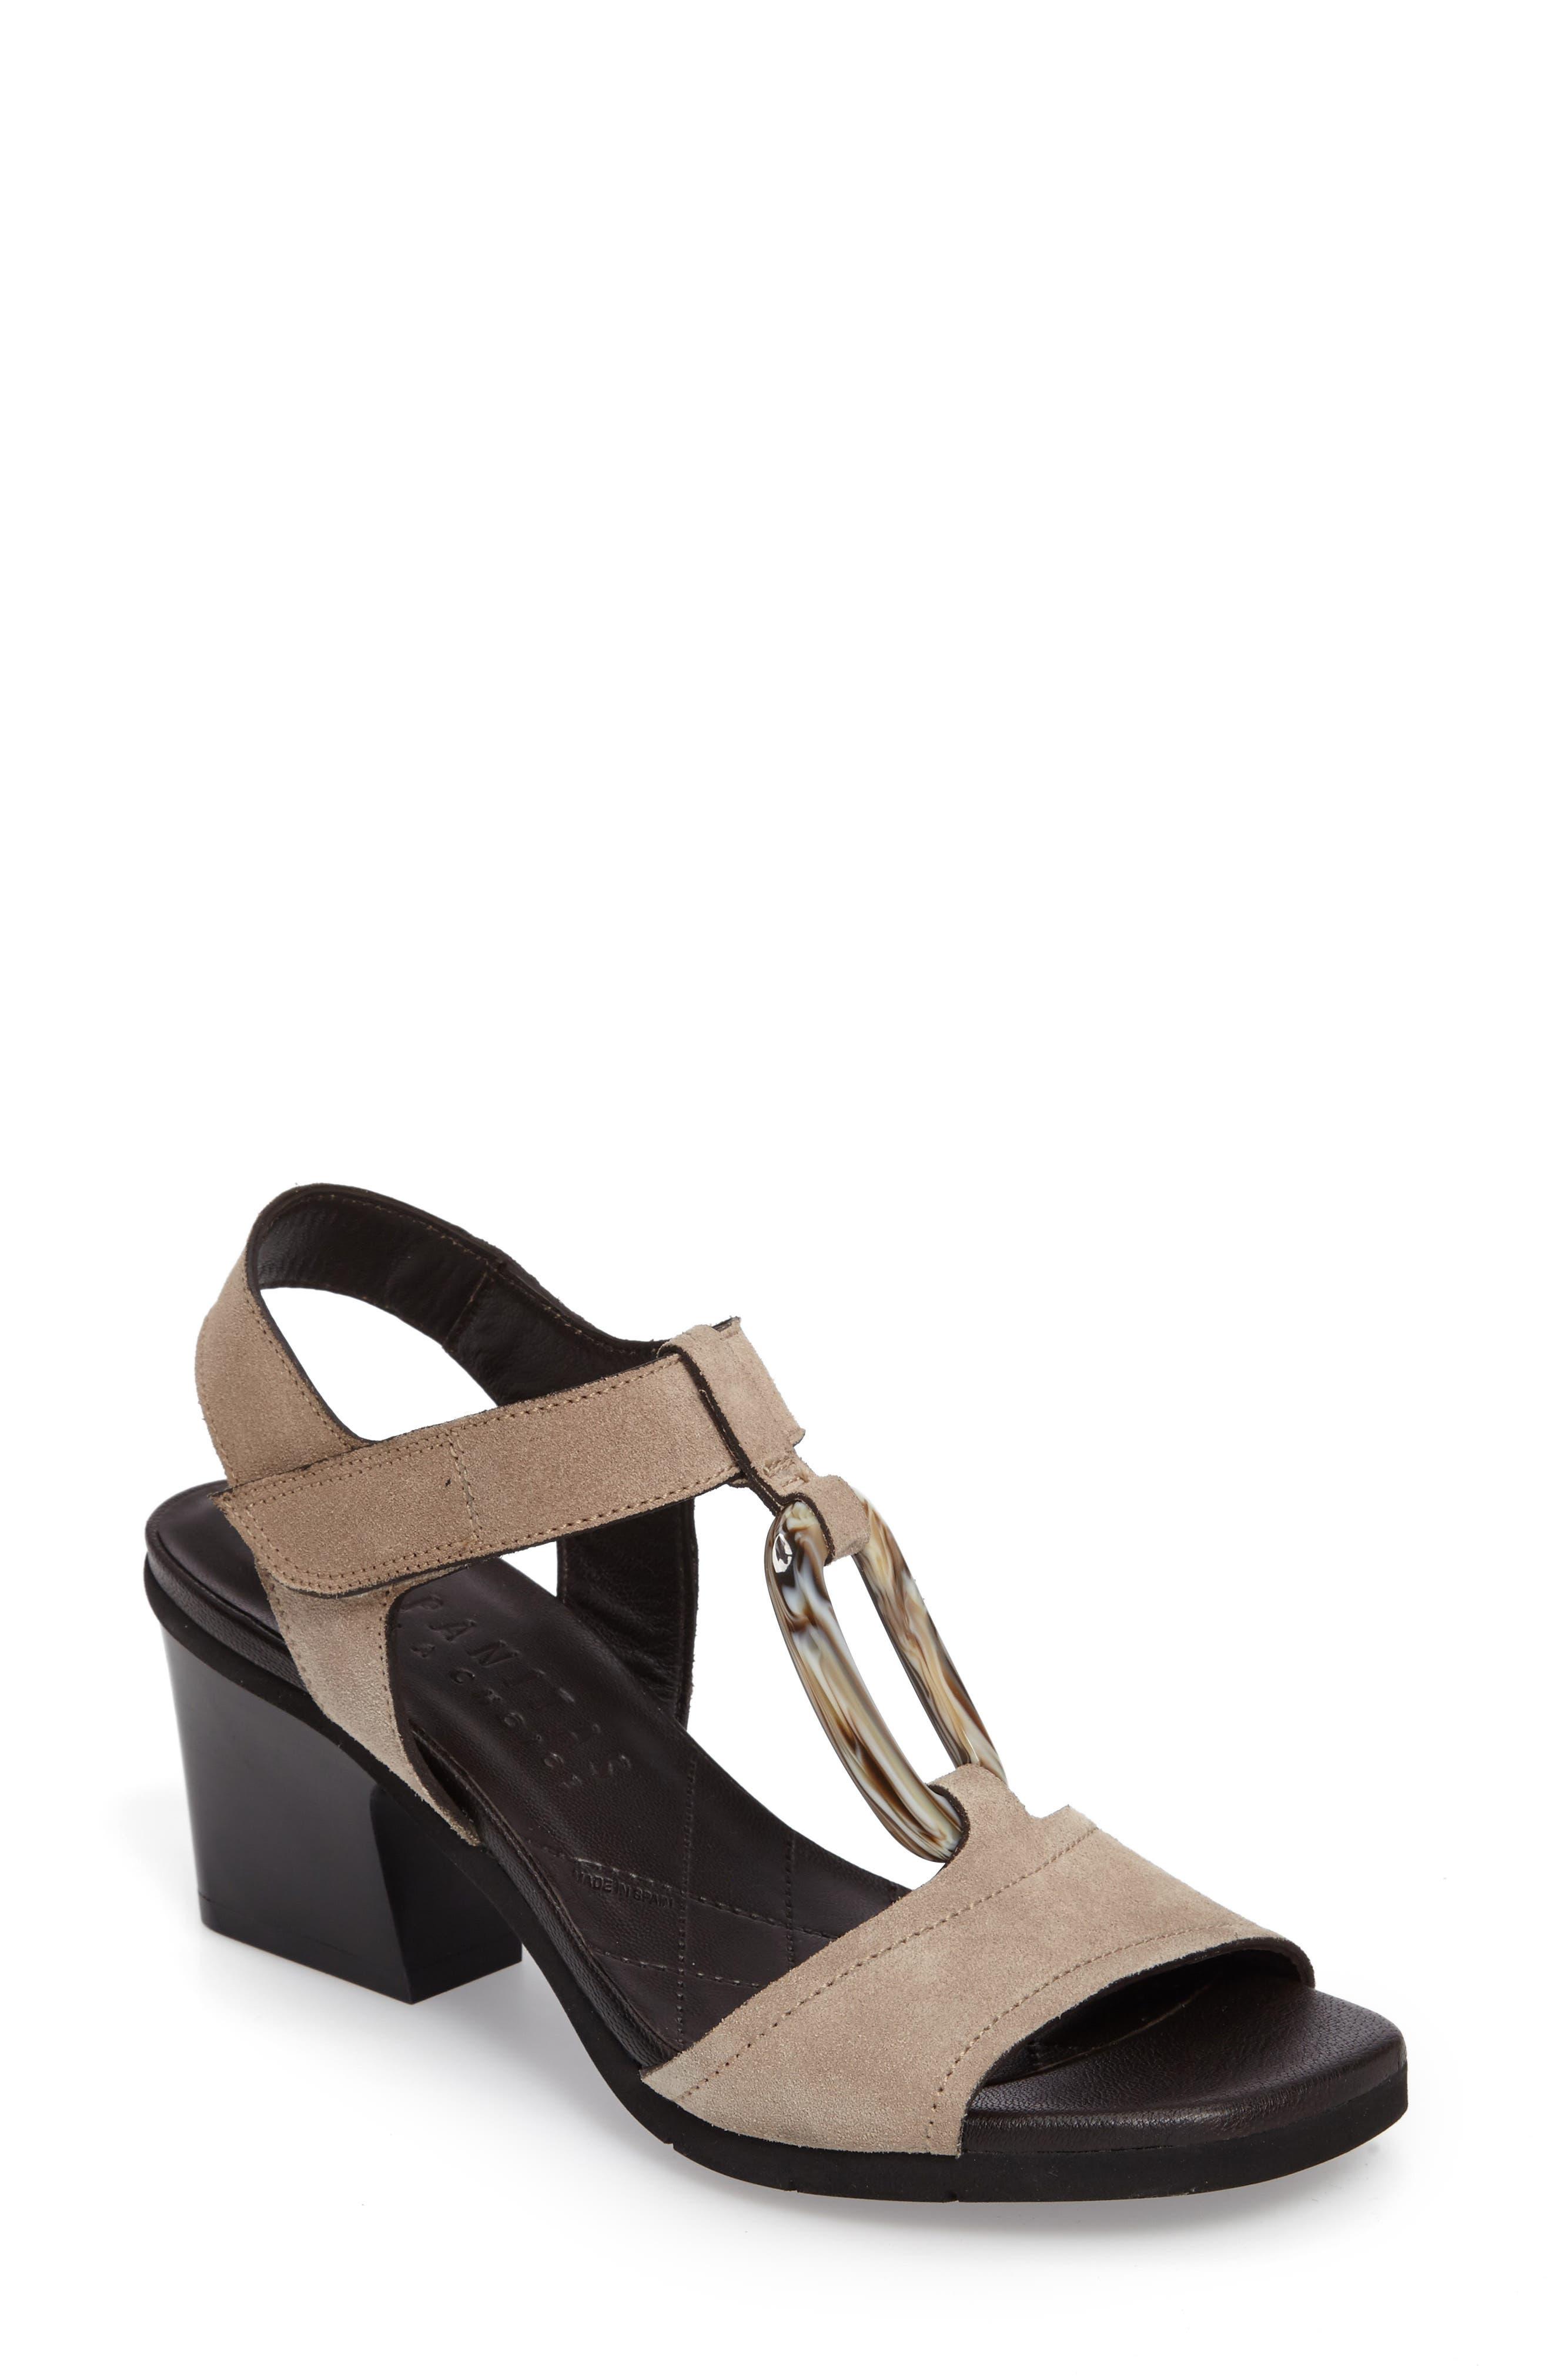 Ursula Ringed T-Strap Sandal,                         Main,                         color, Velour Elm Fabric